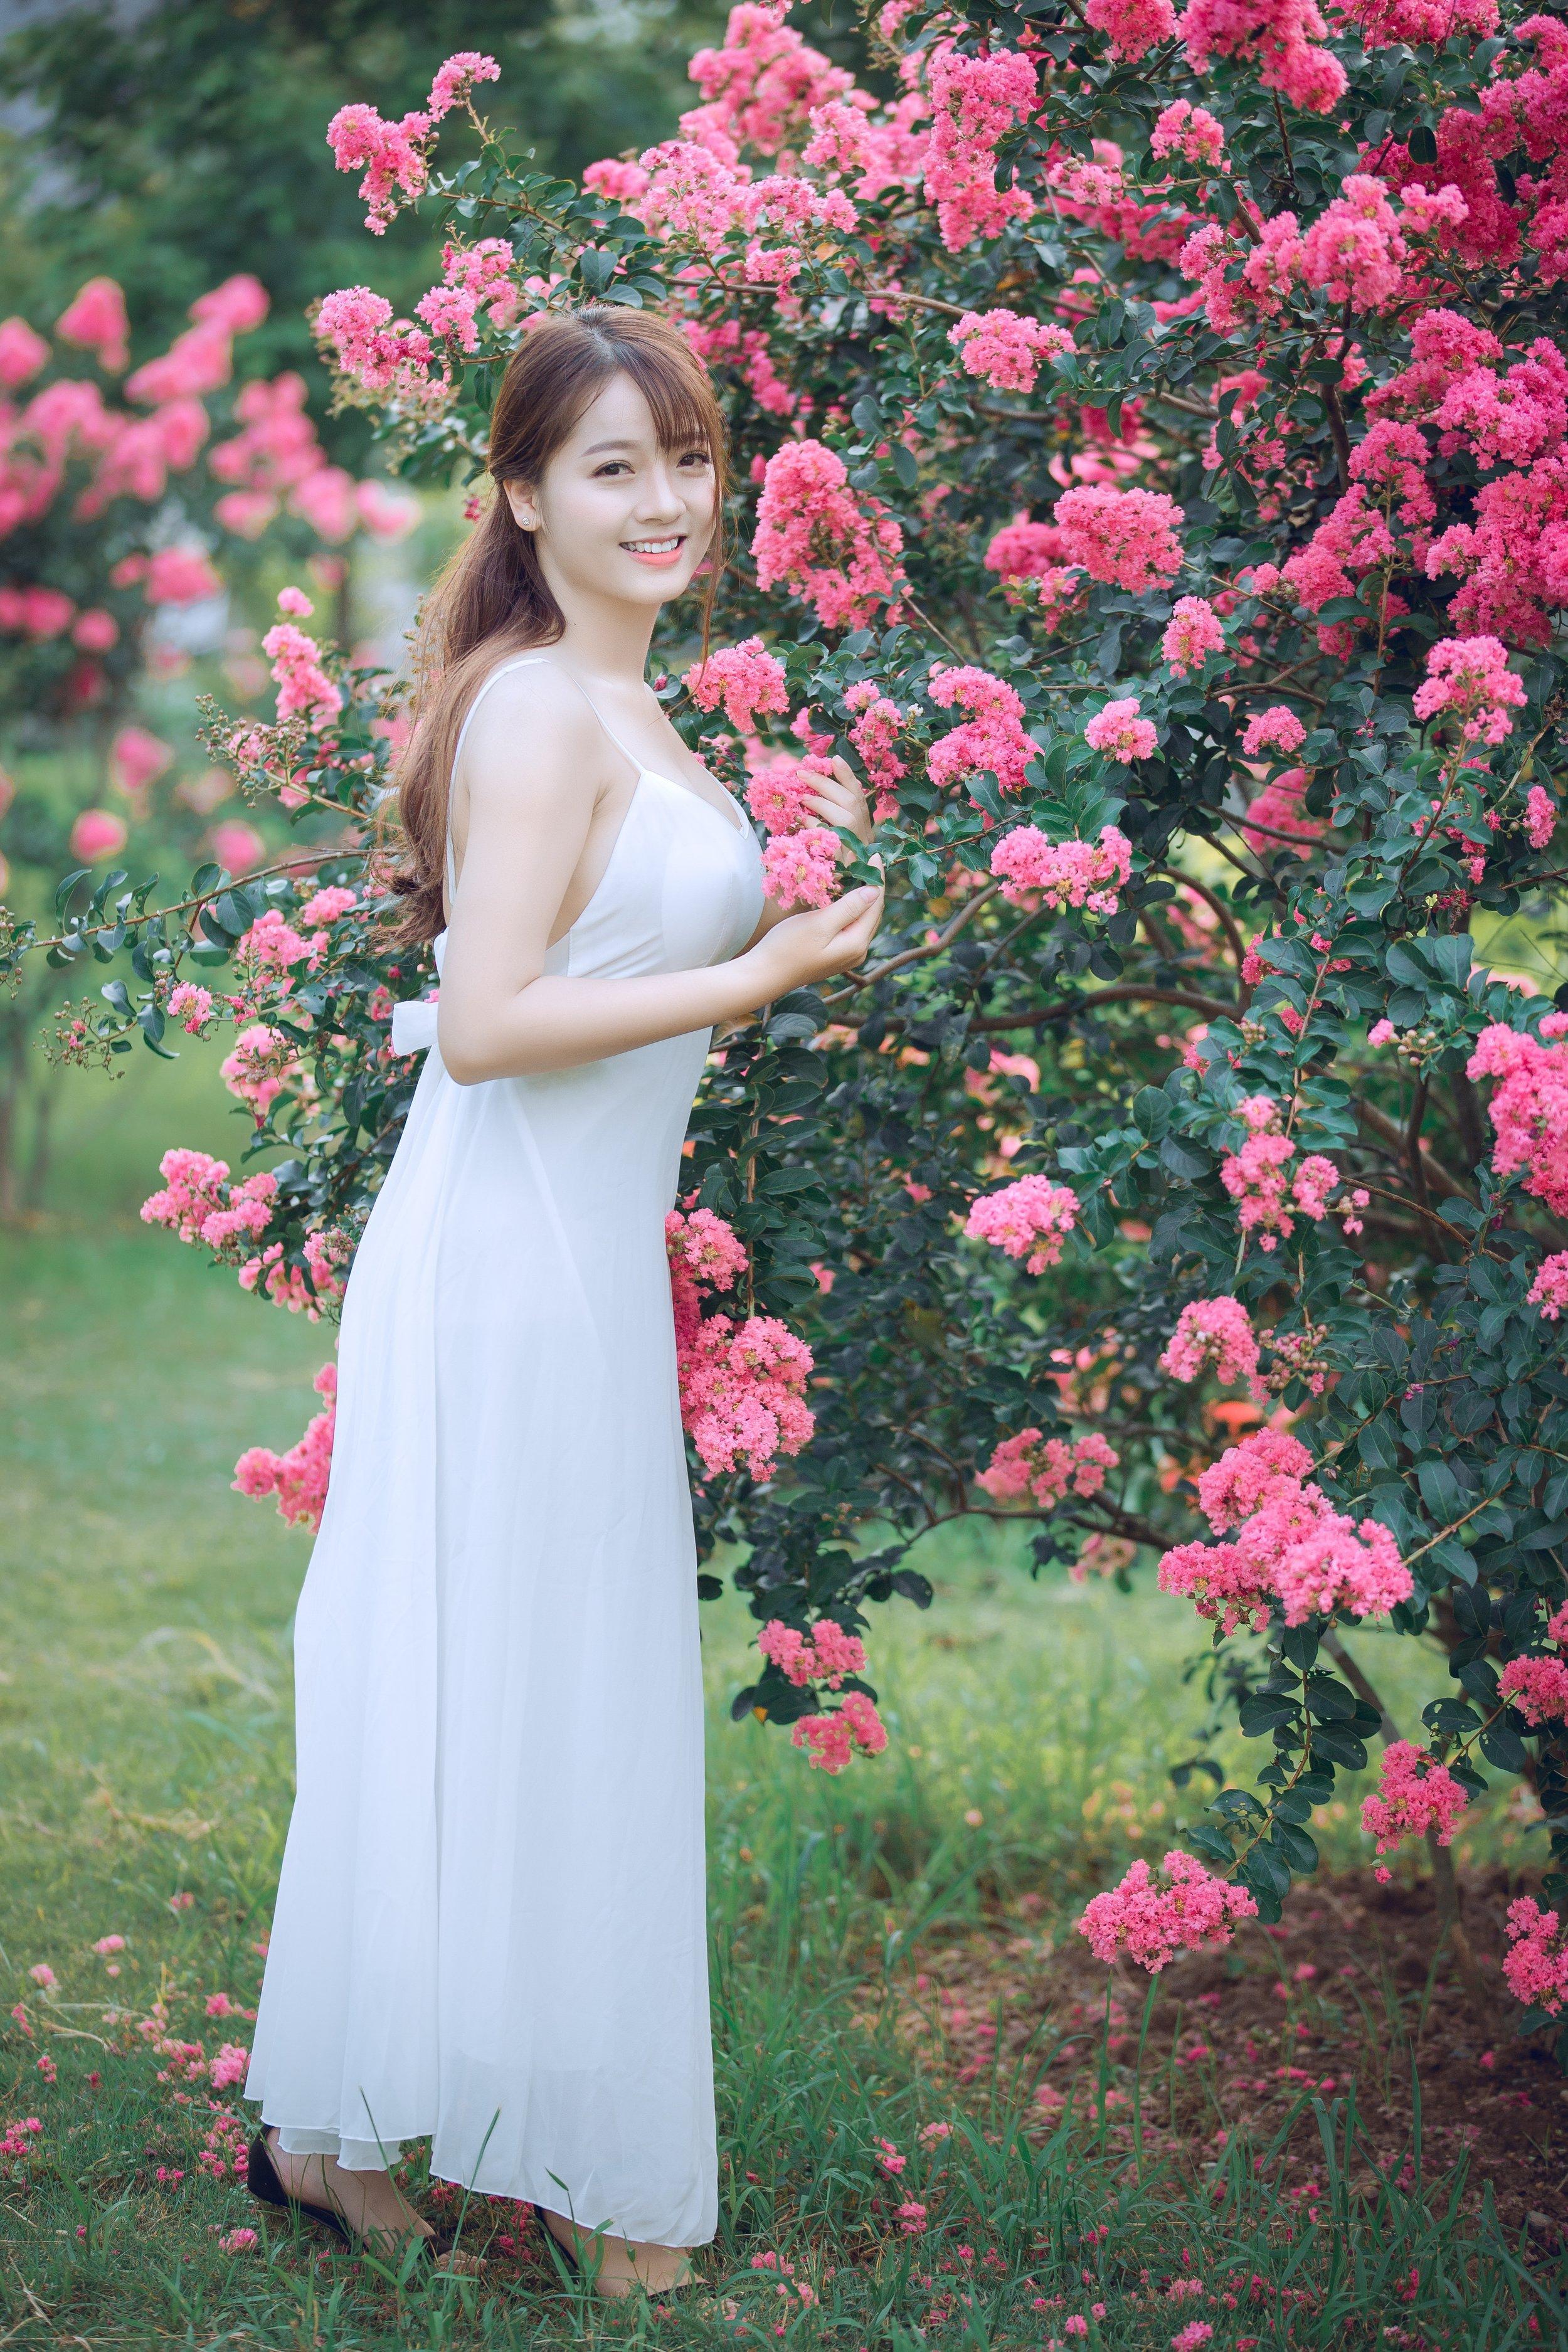 beautiful-bloom-blossom-1406764.jpg